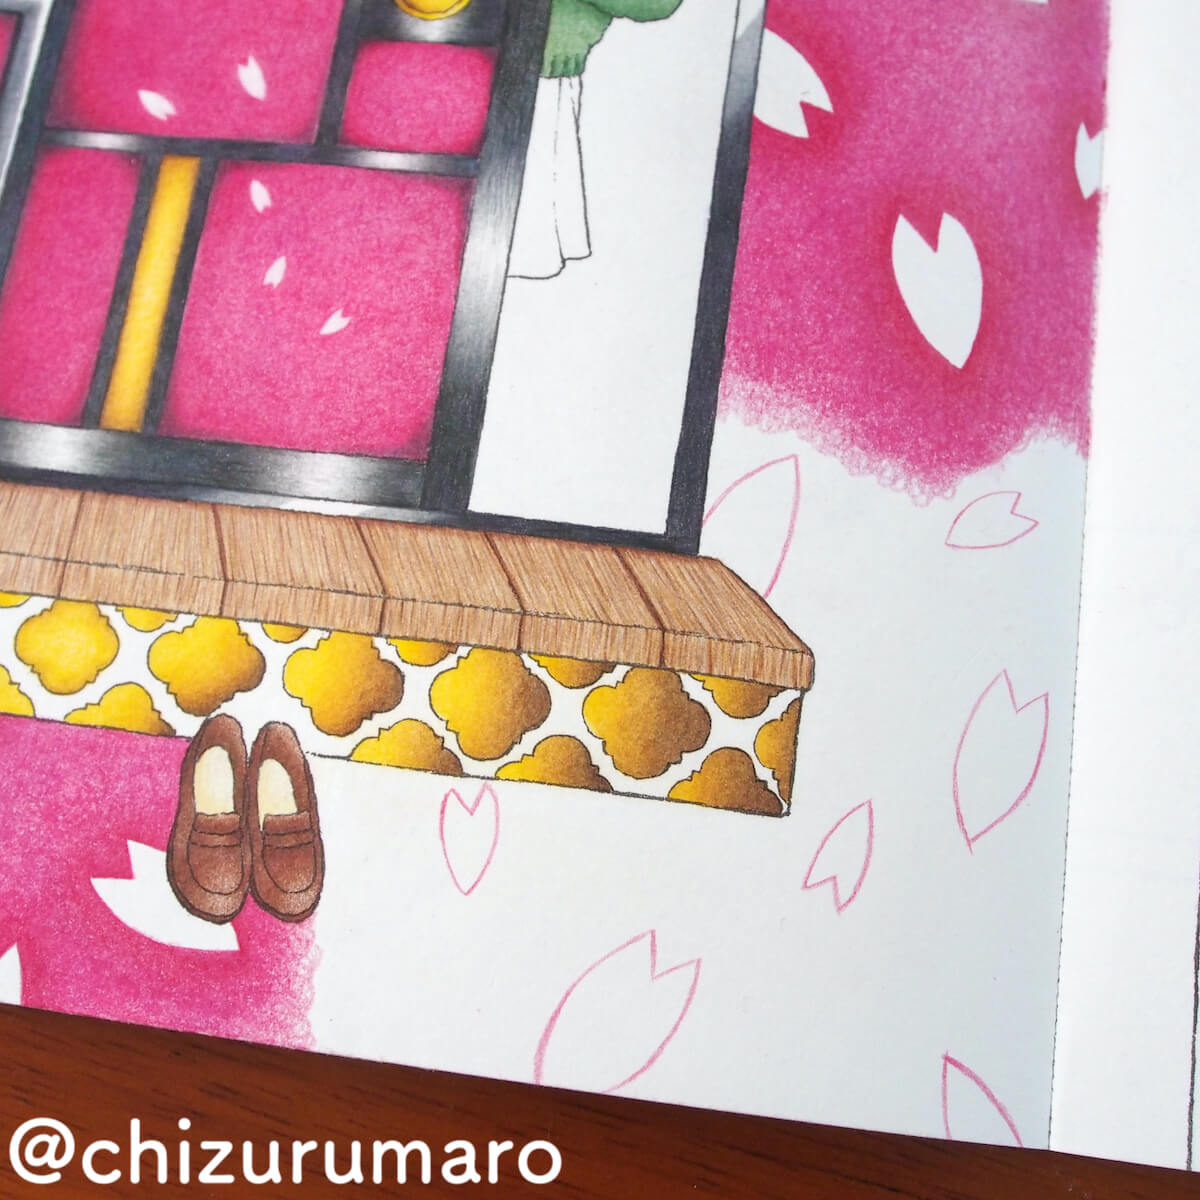 f:id:chizurumaro:20210828153541j:plain